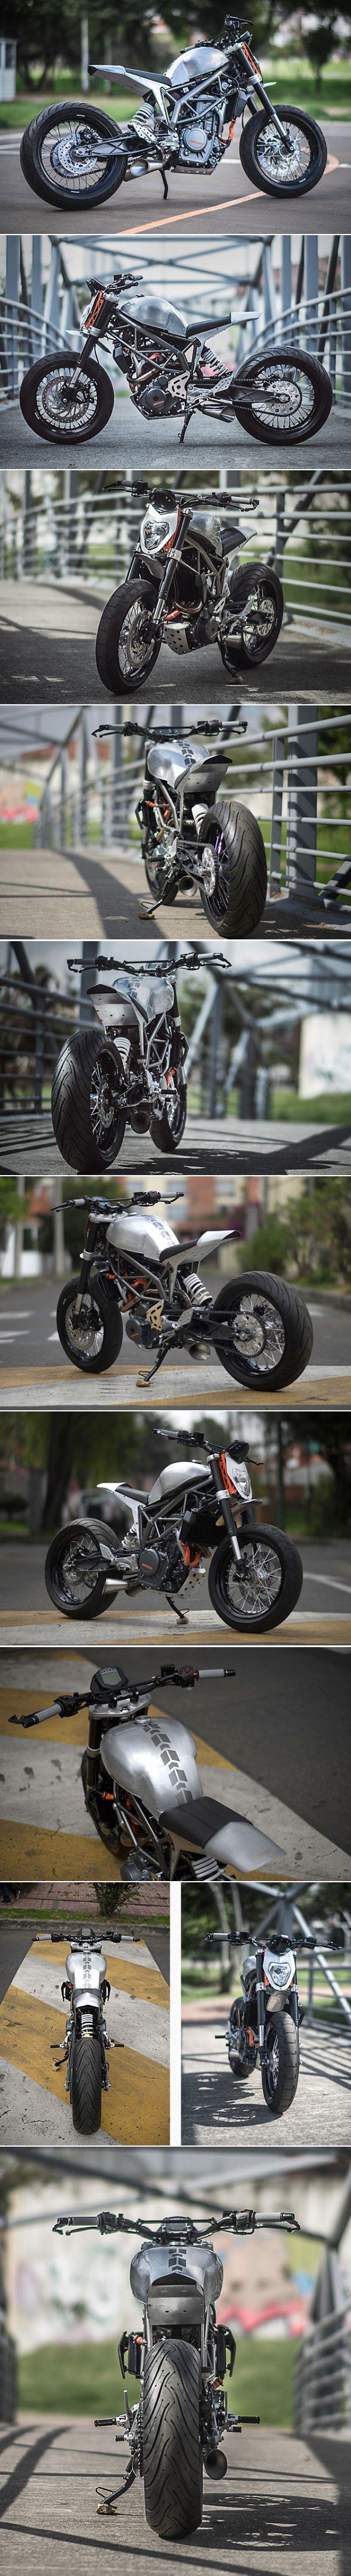 KTM 390 Duke – Garaje 57                                                                                                                                                      Más